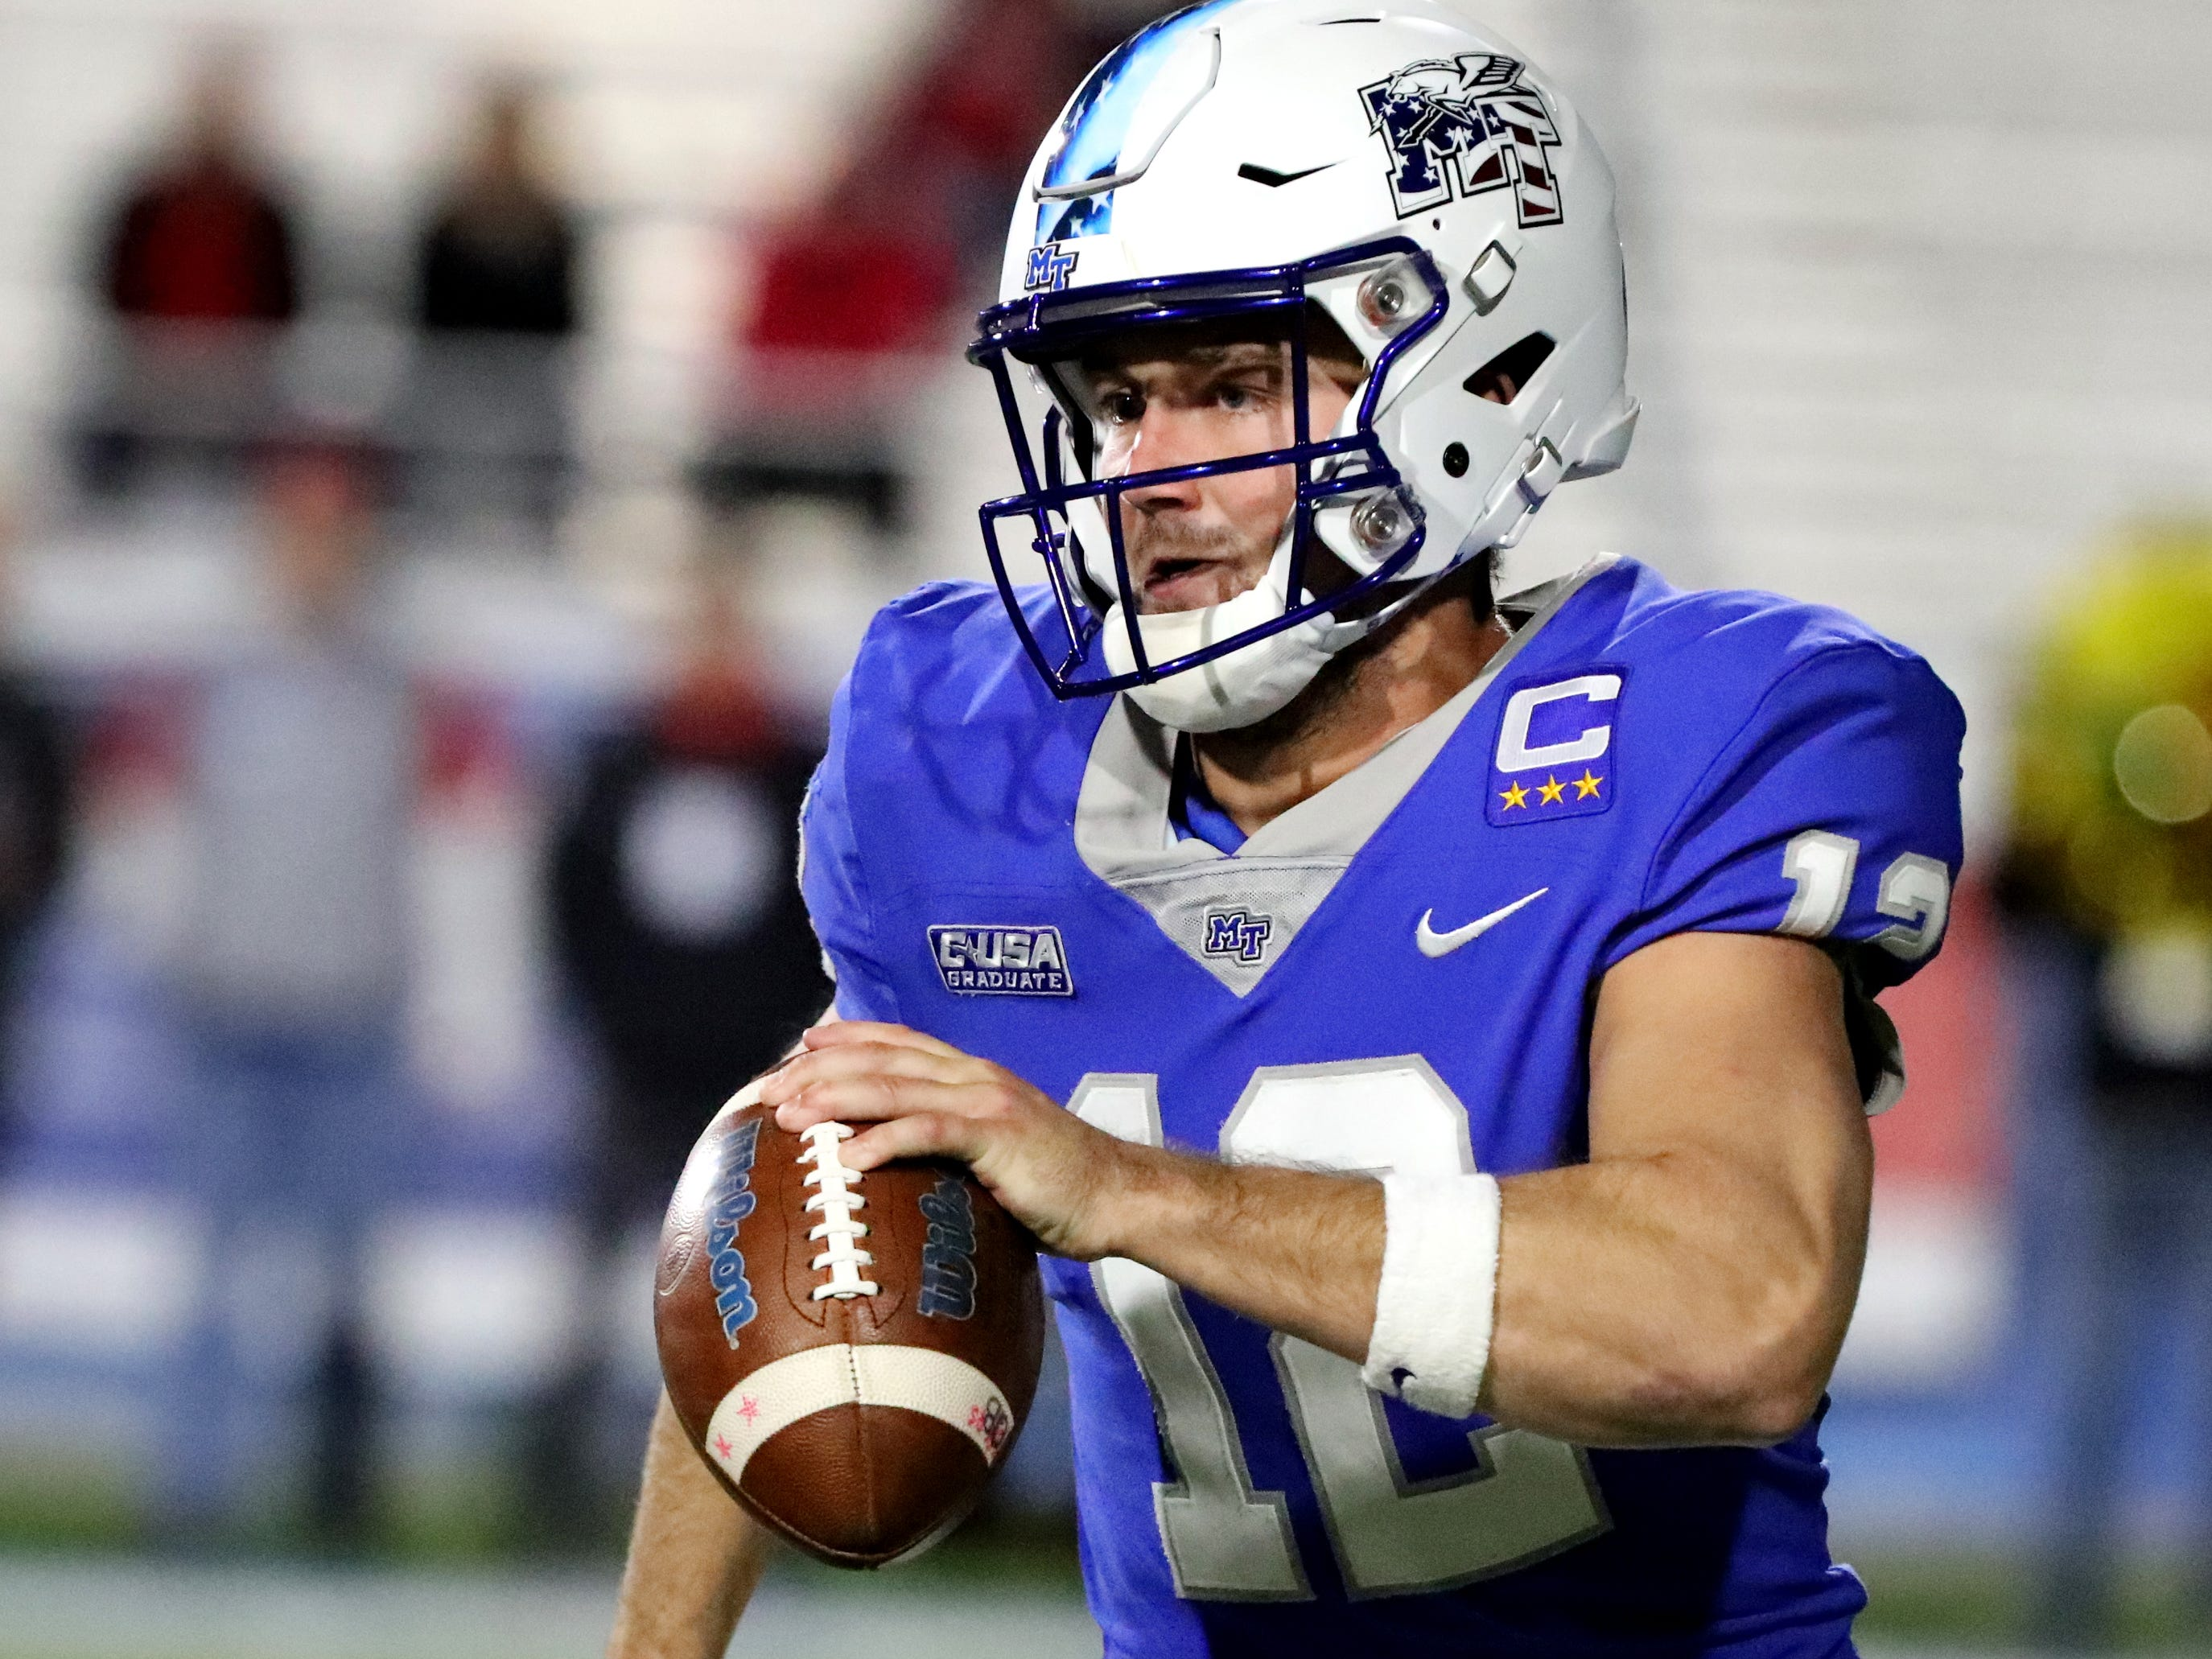 MTSU 29, WKU 10: What we learned as Blue Raiders end losing streak to Western Kentucky